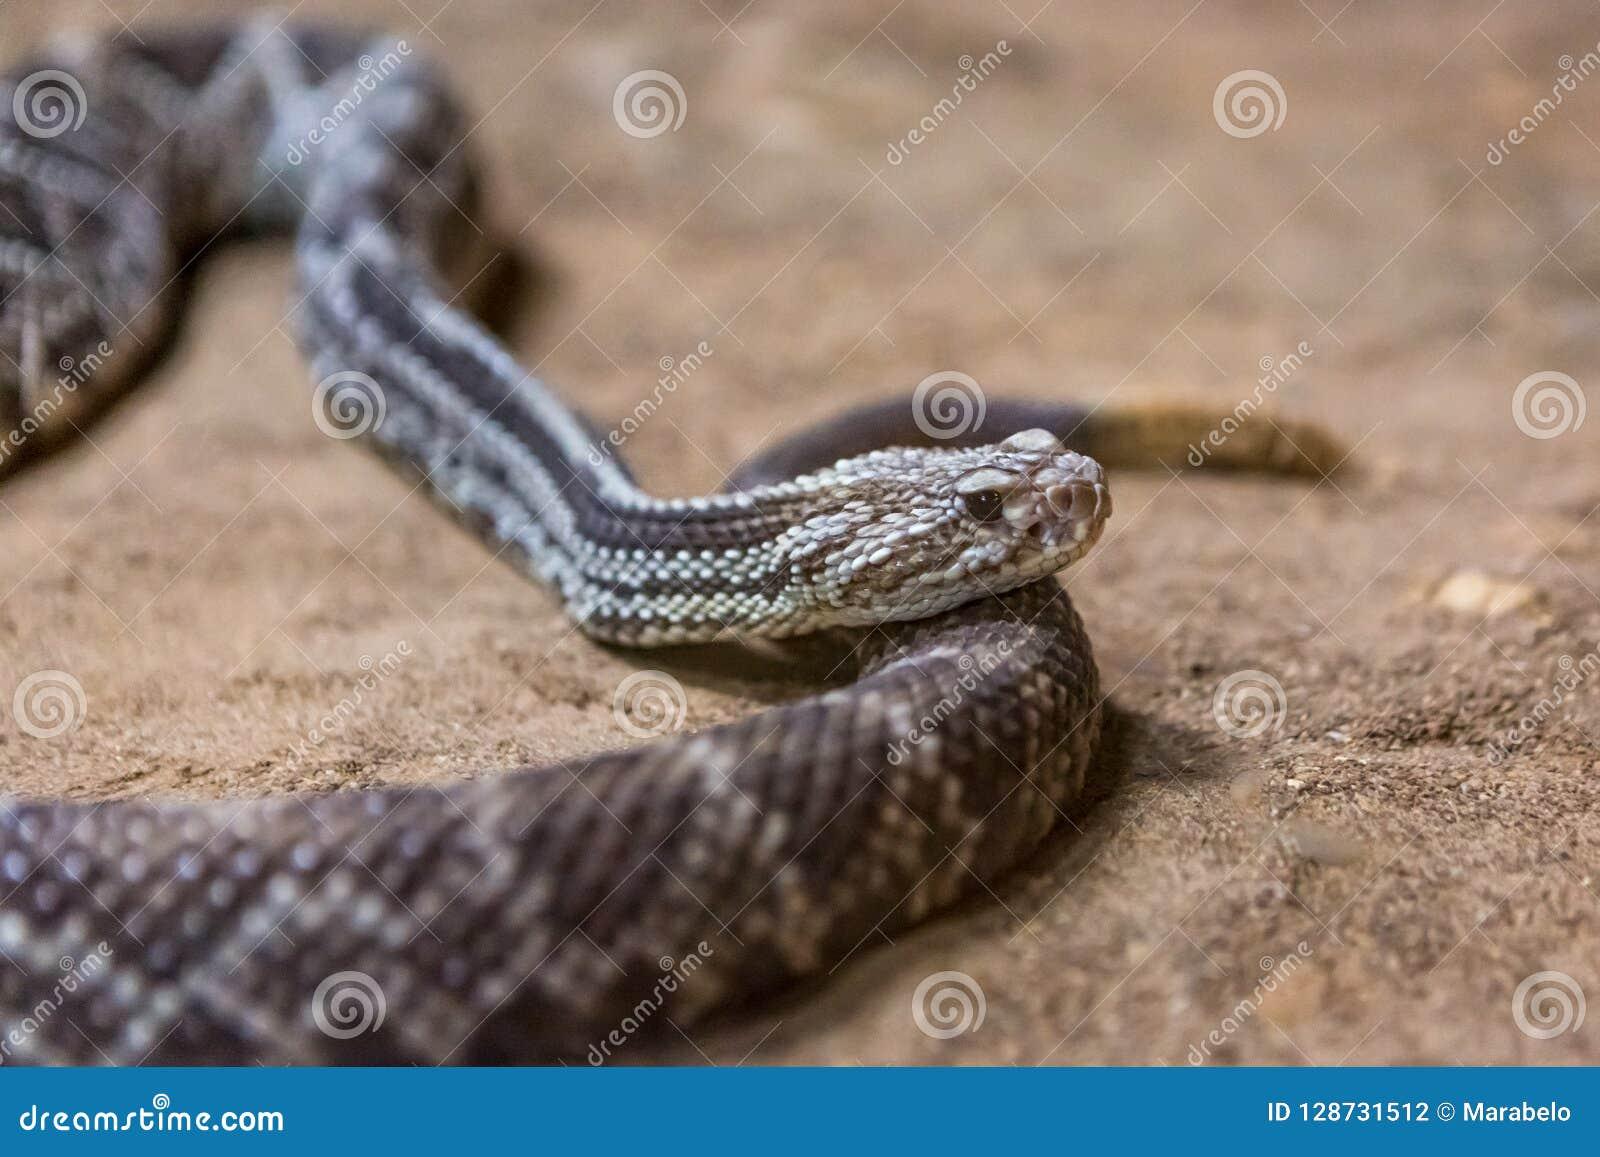 Rattlesnake, Crotalus Atrox  Western Diamondback  Stock